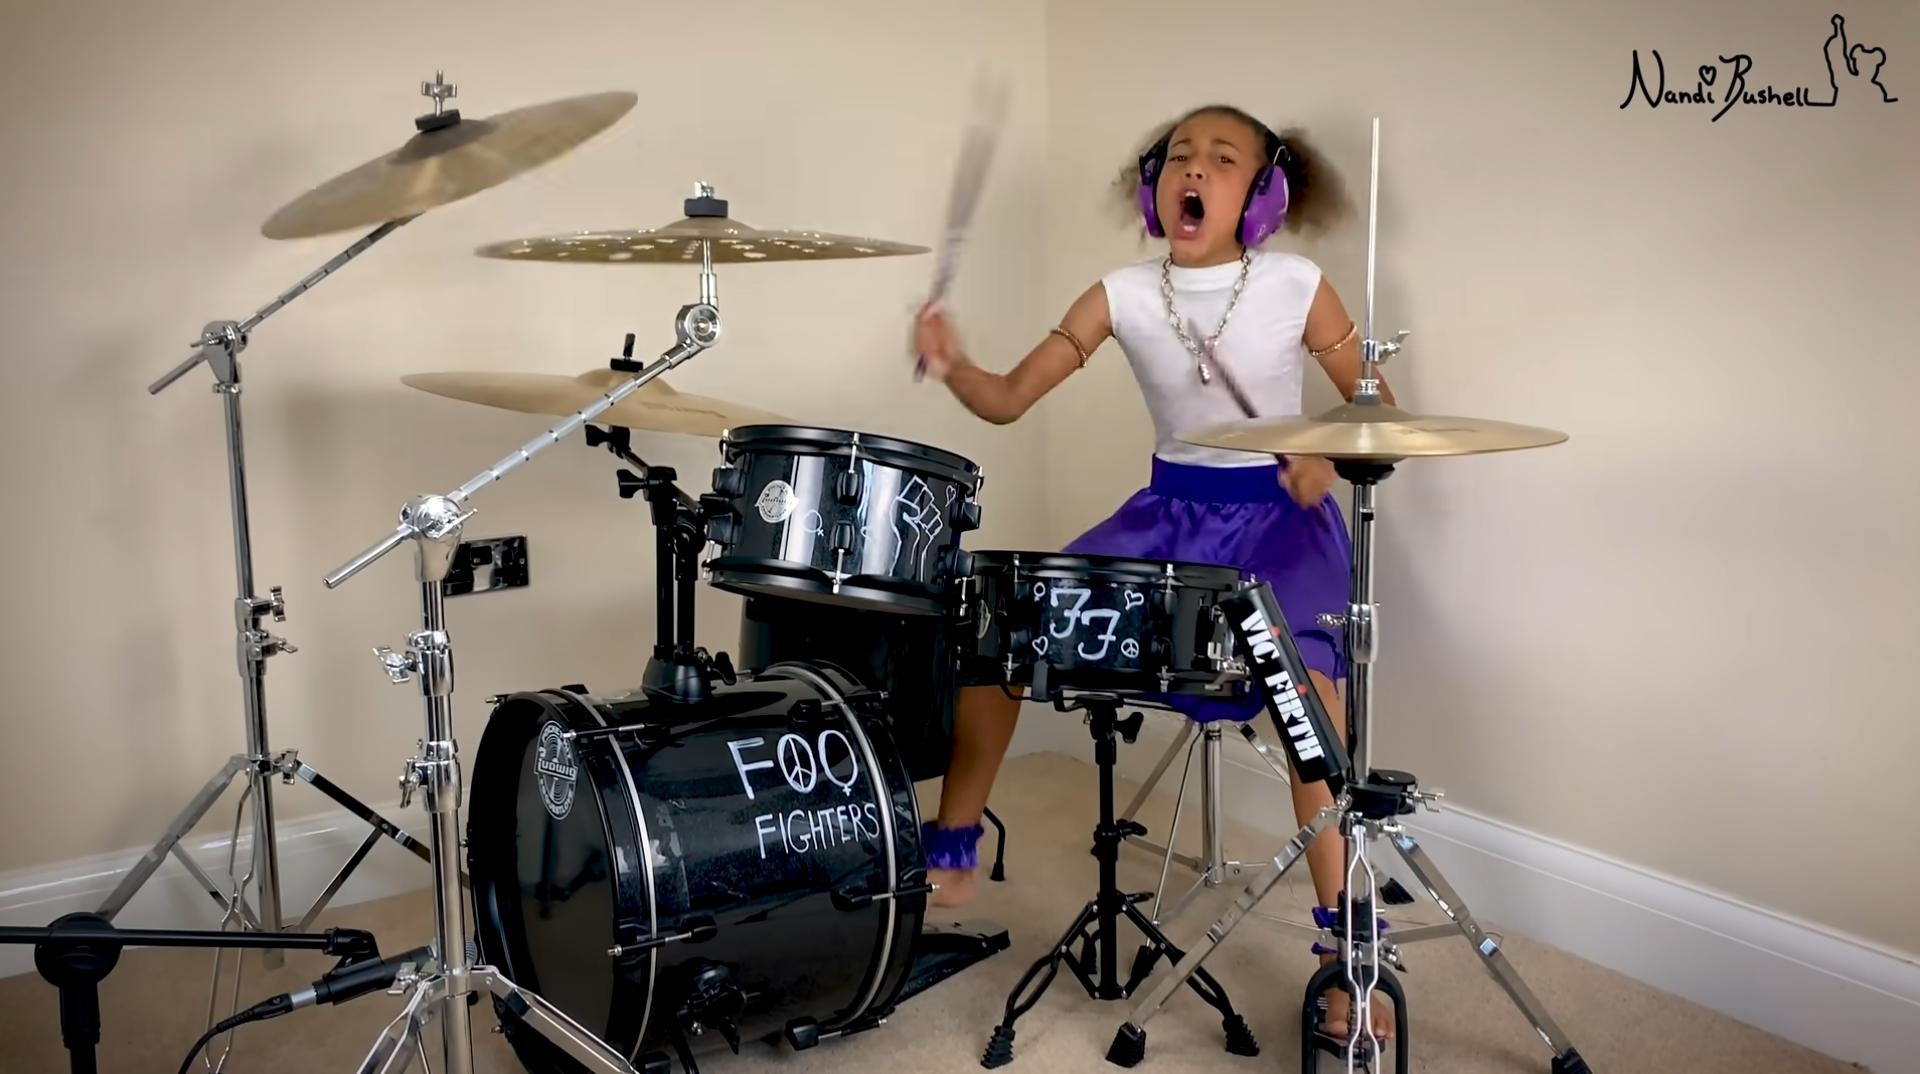 Nandi Burshell on the drums